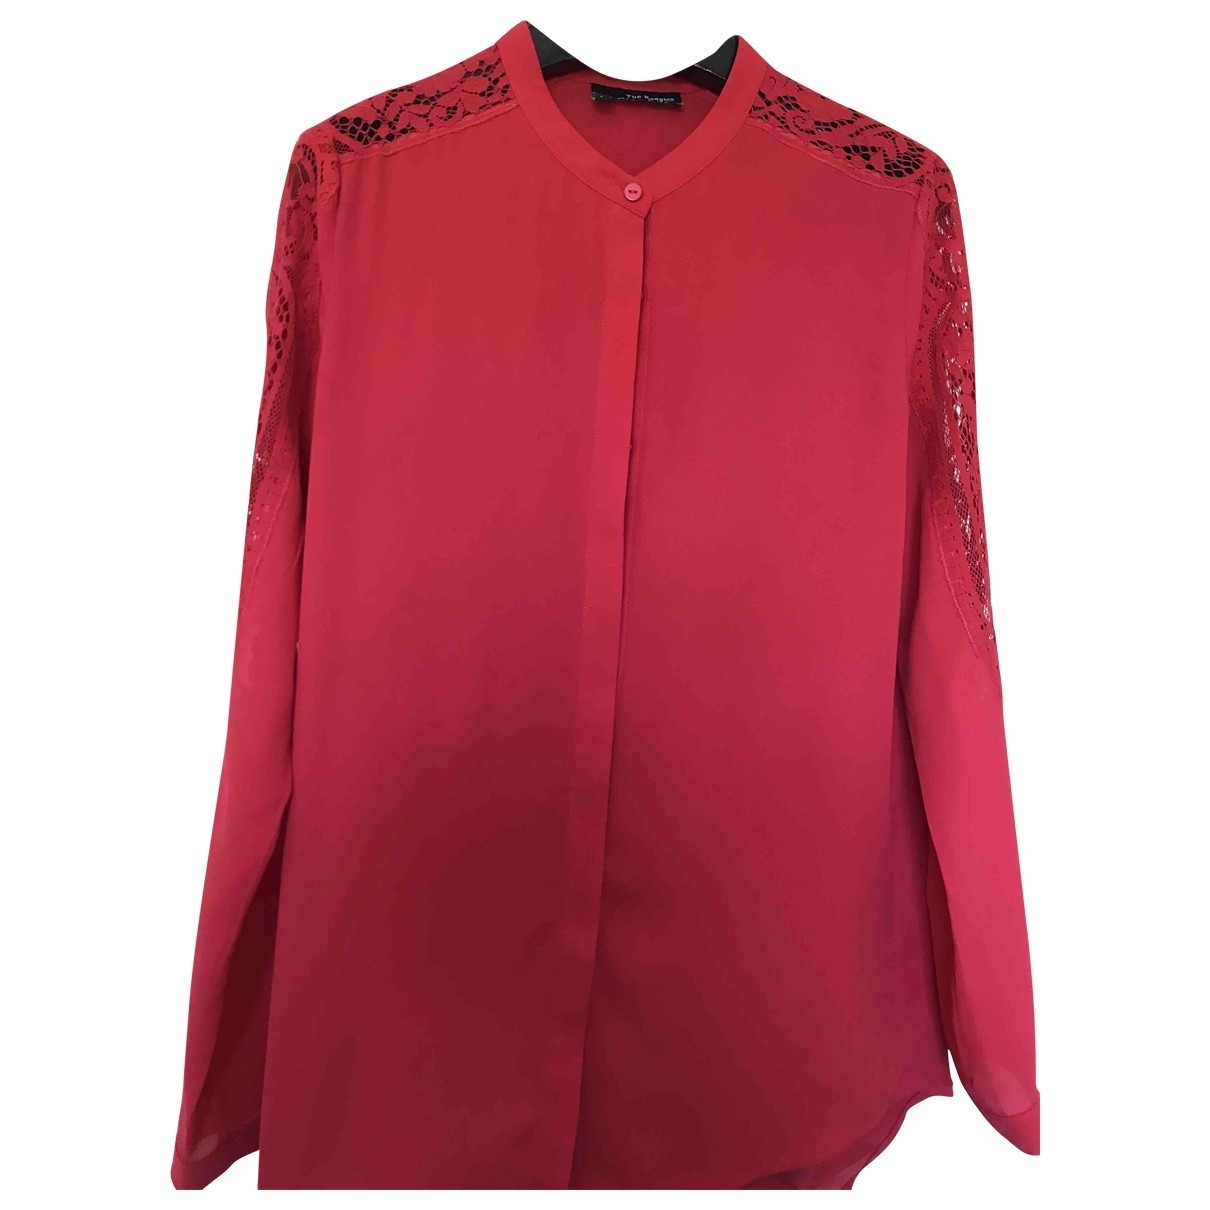 The Kooples \N Red  top for Women S International